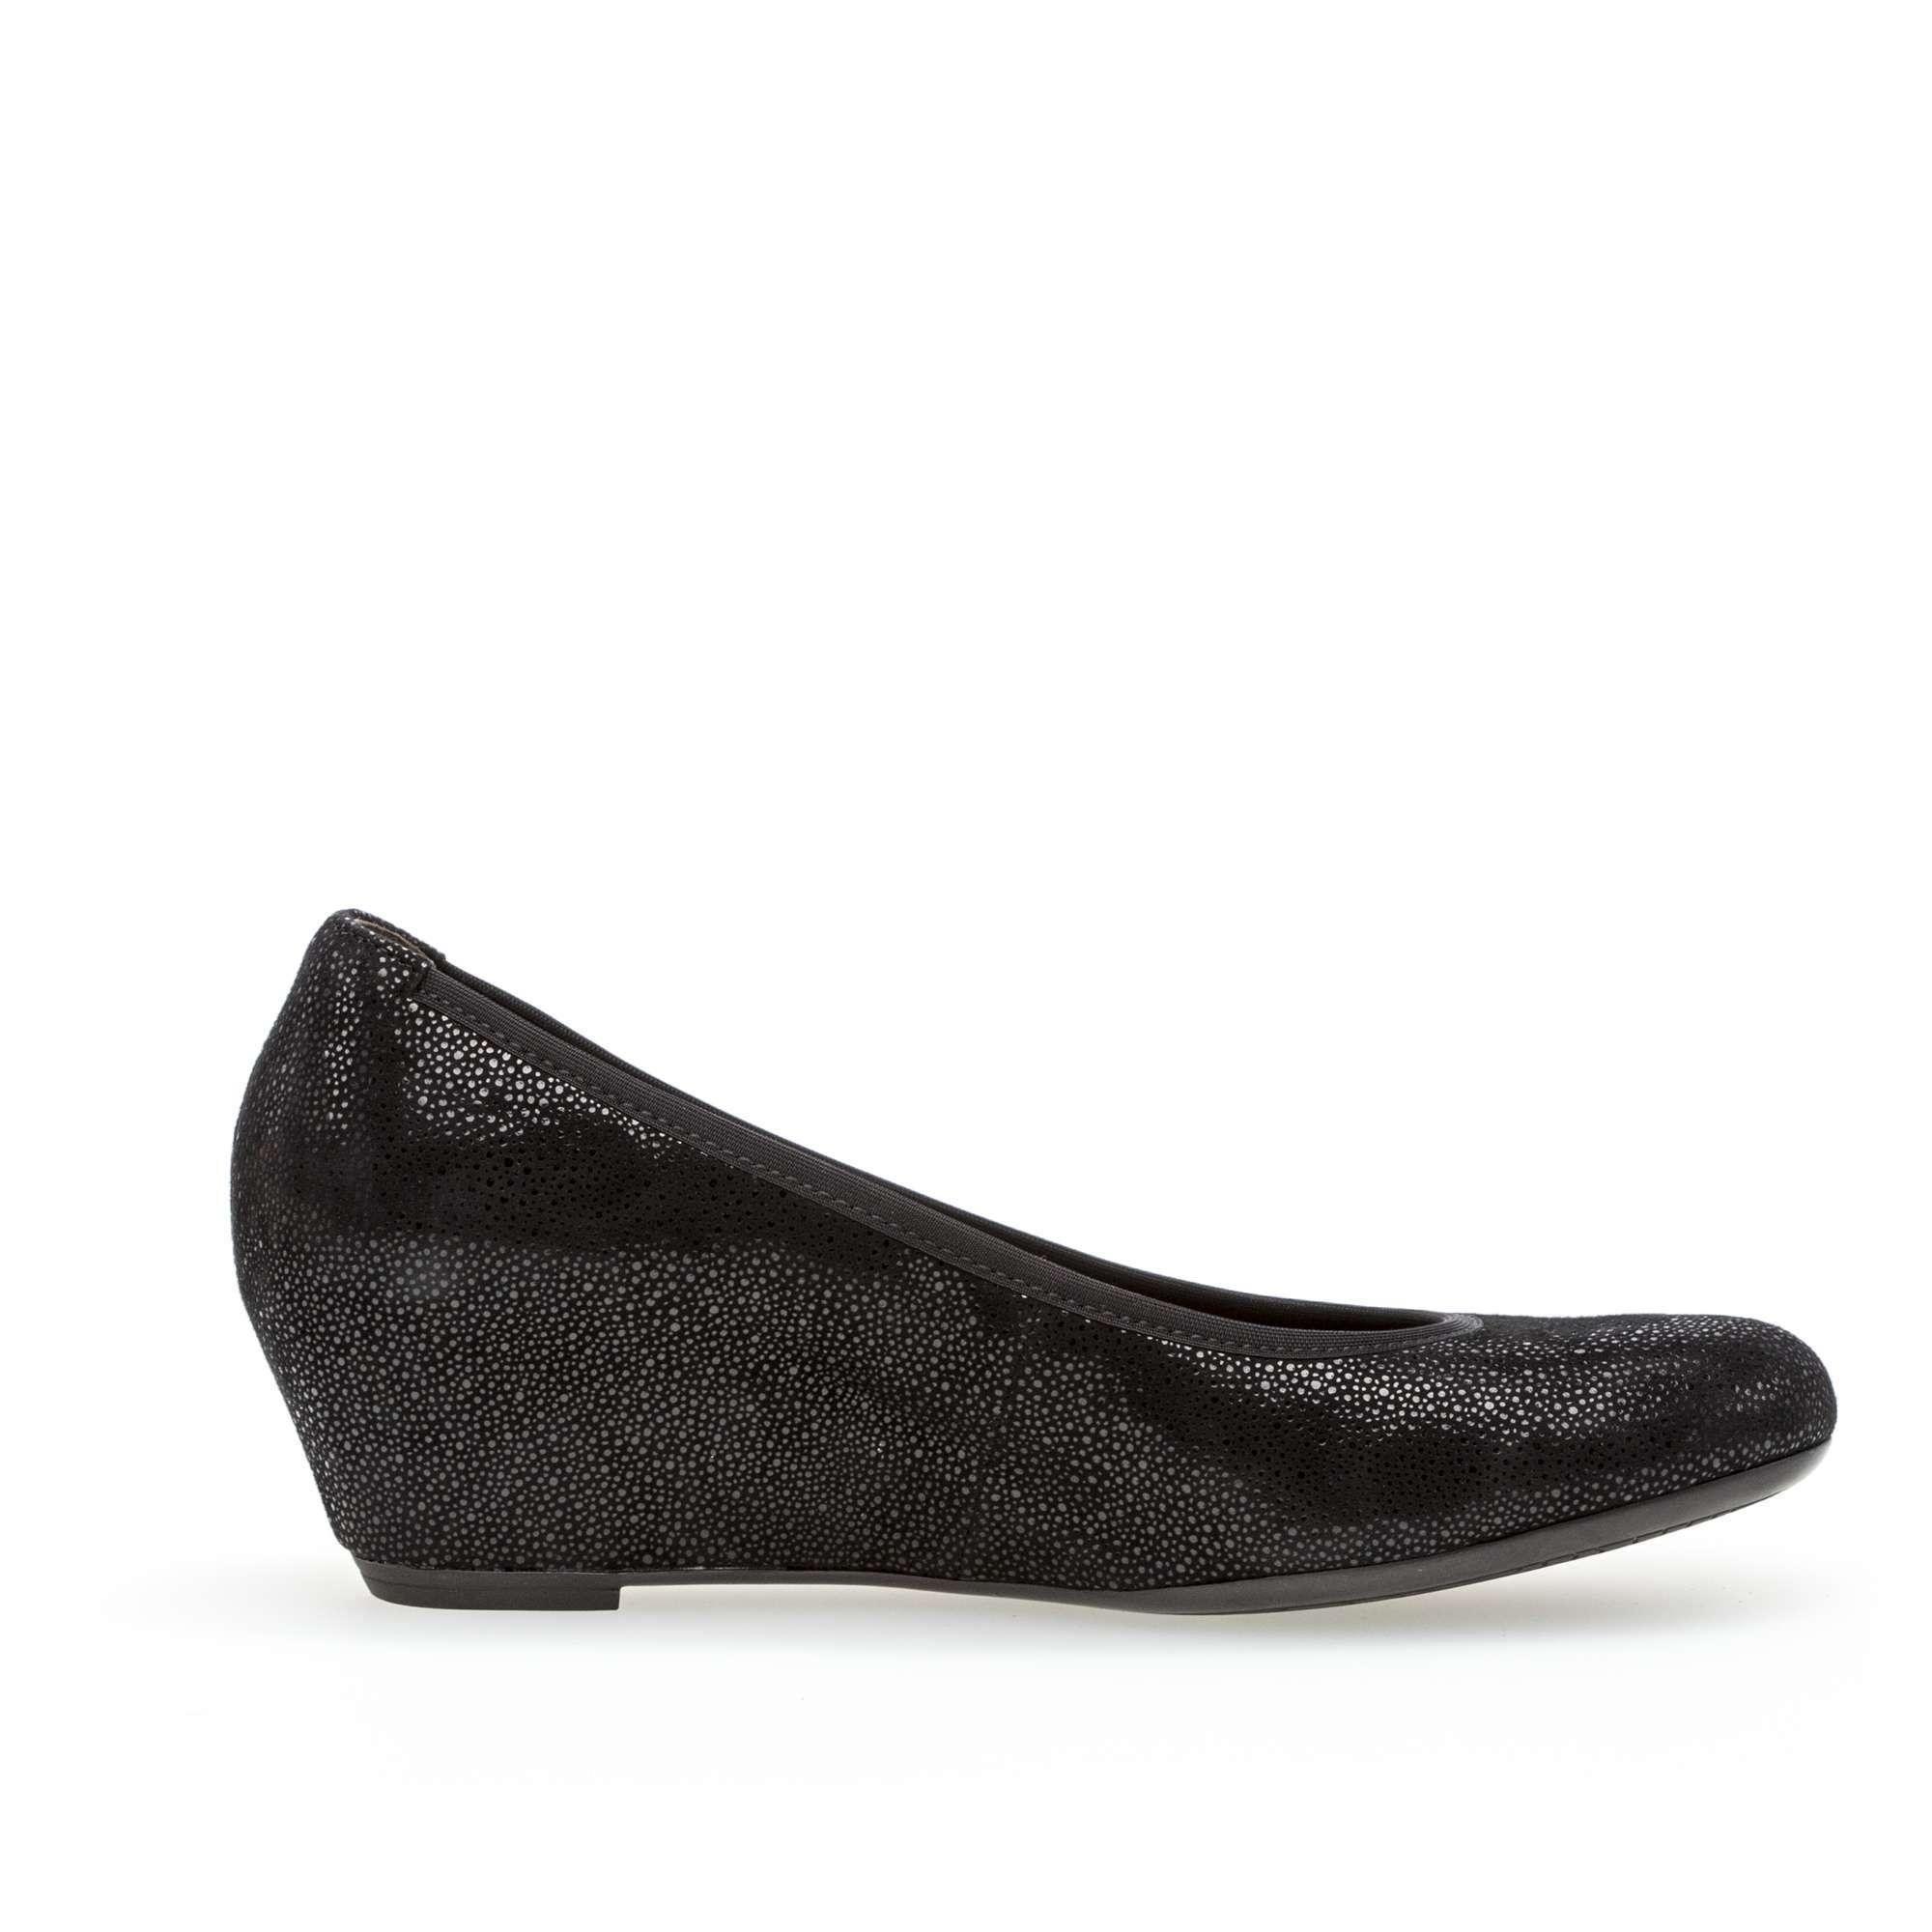 daaa7d8465b6b Gabor Women's Stella Wedge Pump Effect Leather Black   Laurie's Shoes